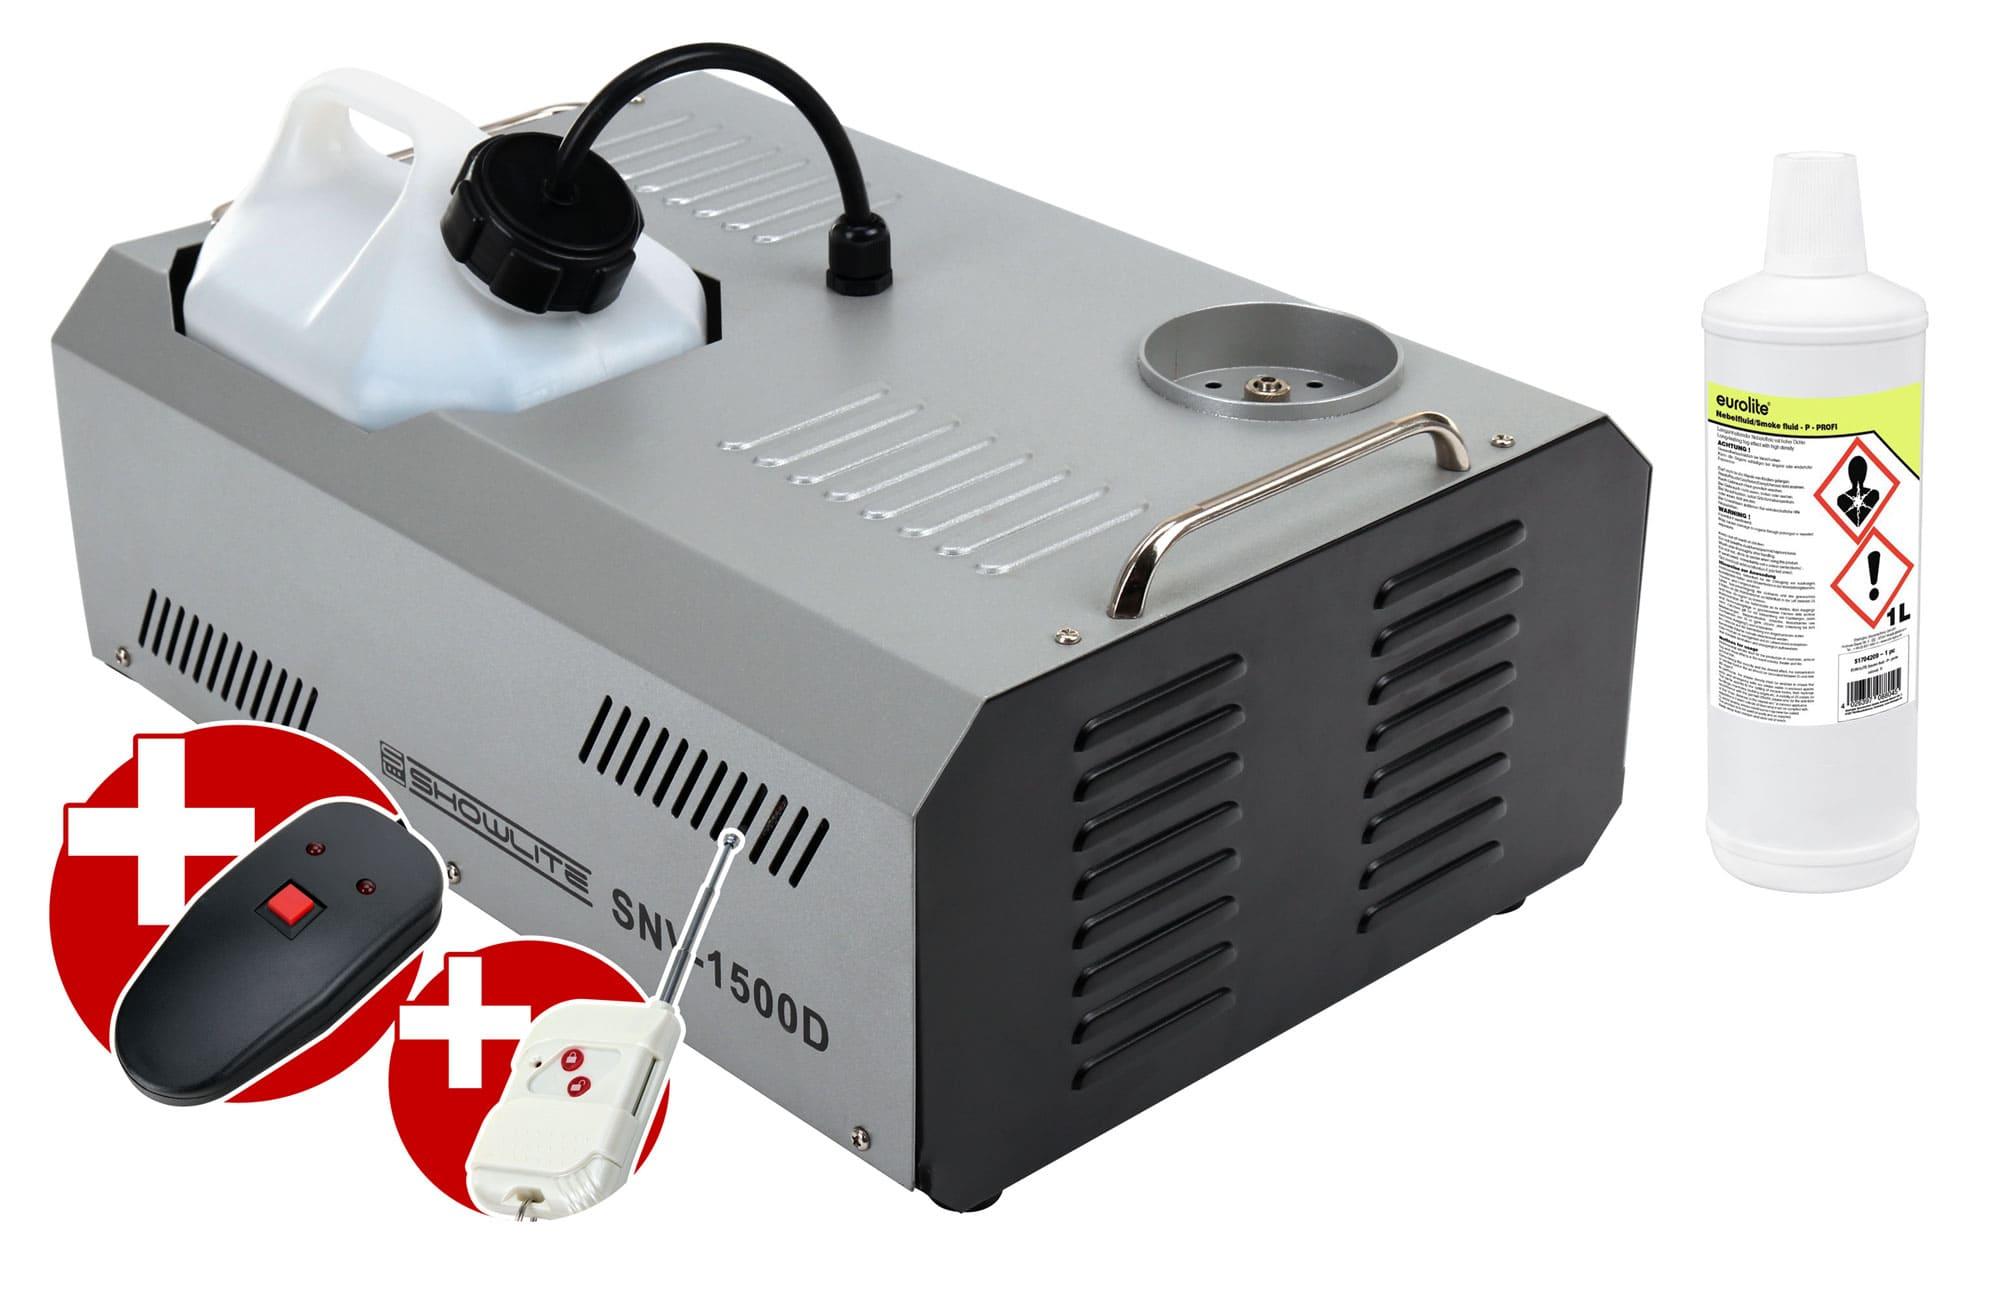 Komplettset Showlite SNV 1500D DMX Vertikal Nebelmaschine 1500W inkl. Fernbedienung 1 L Nebelfluid